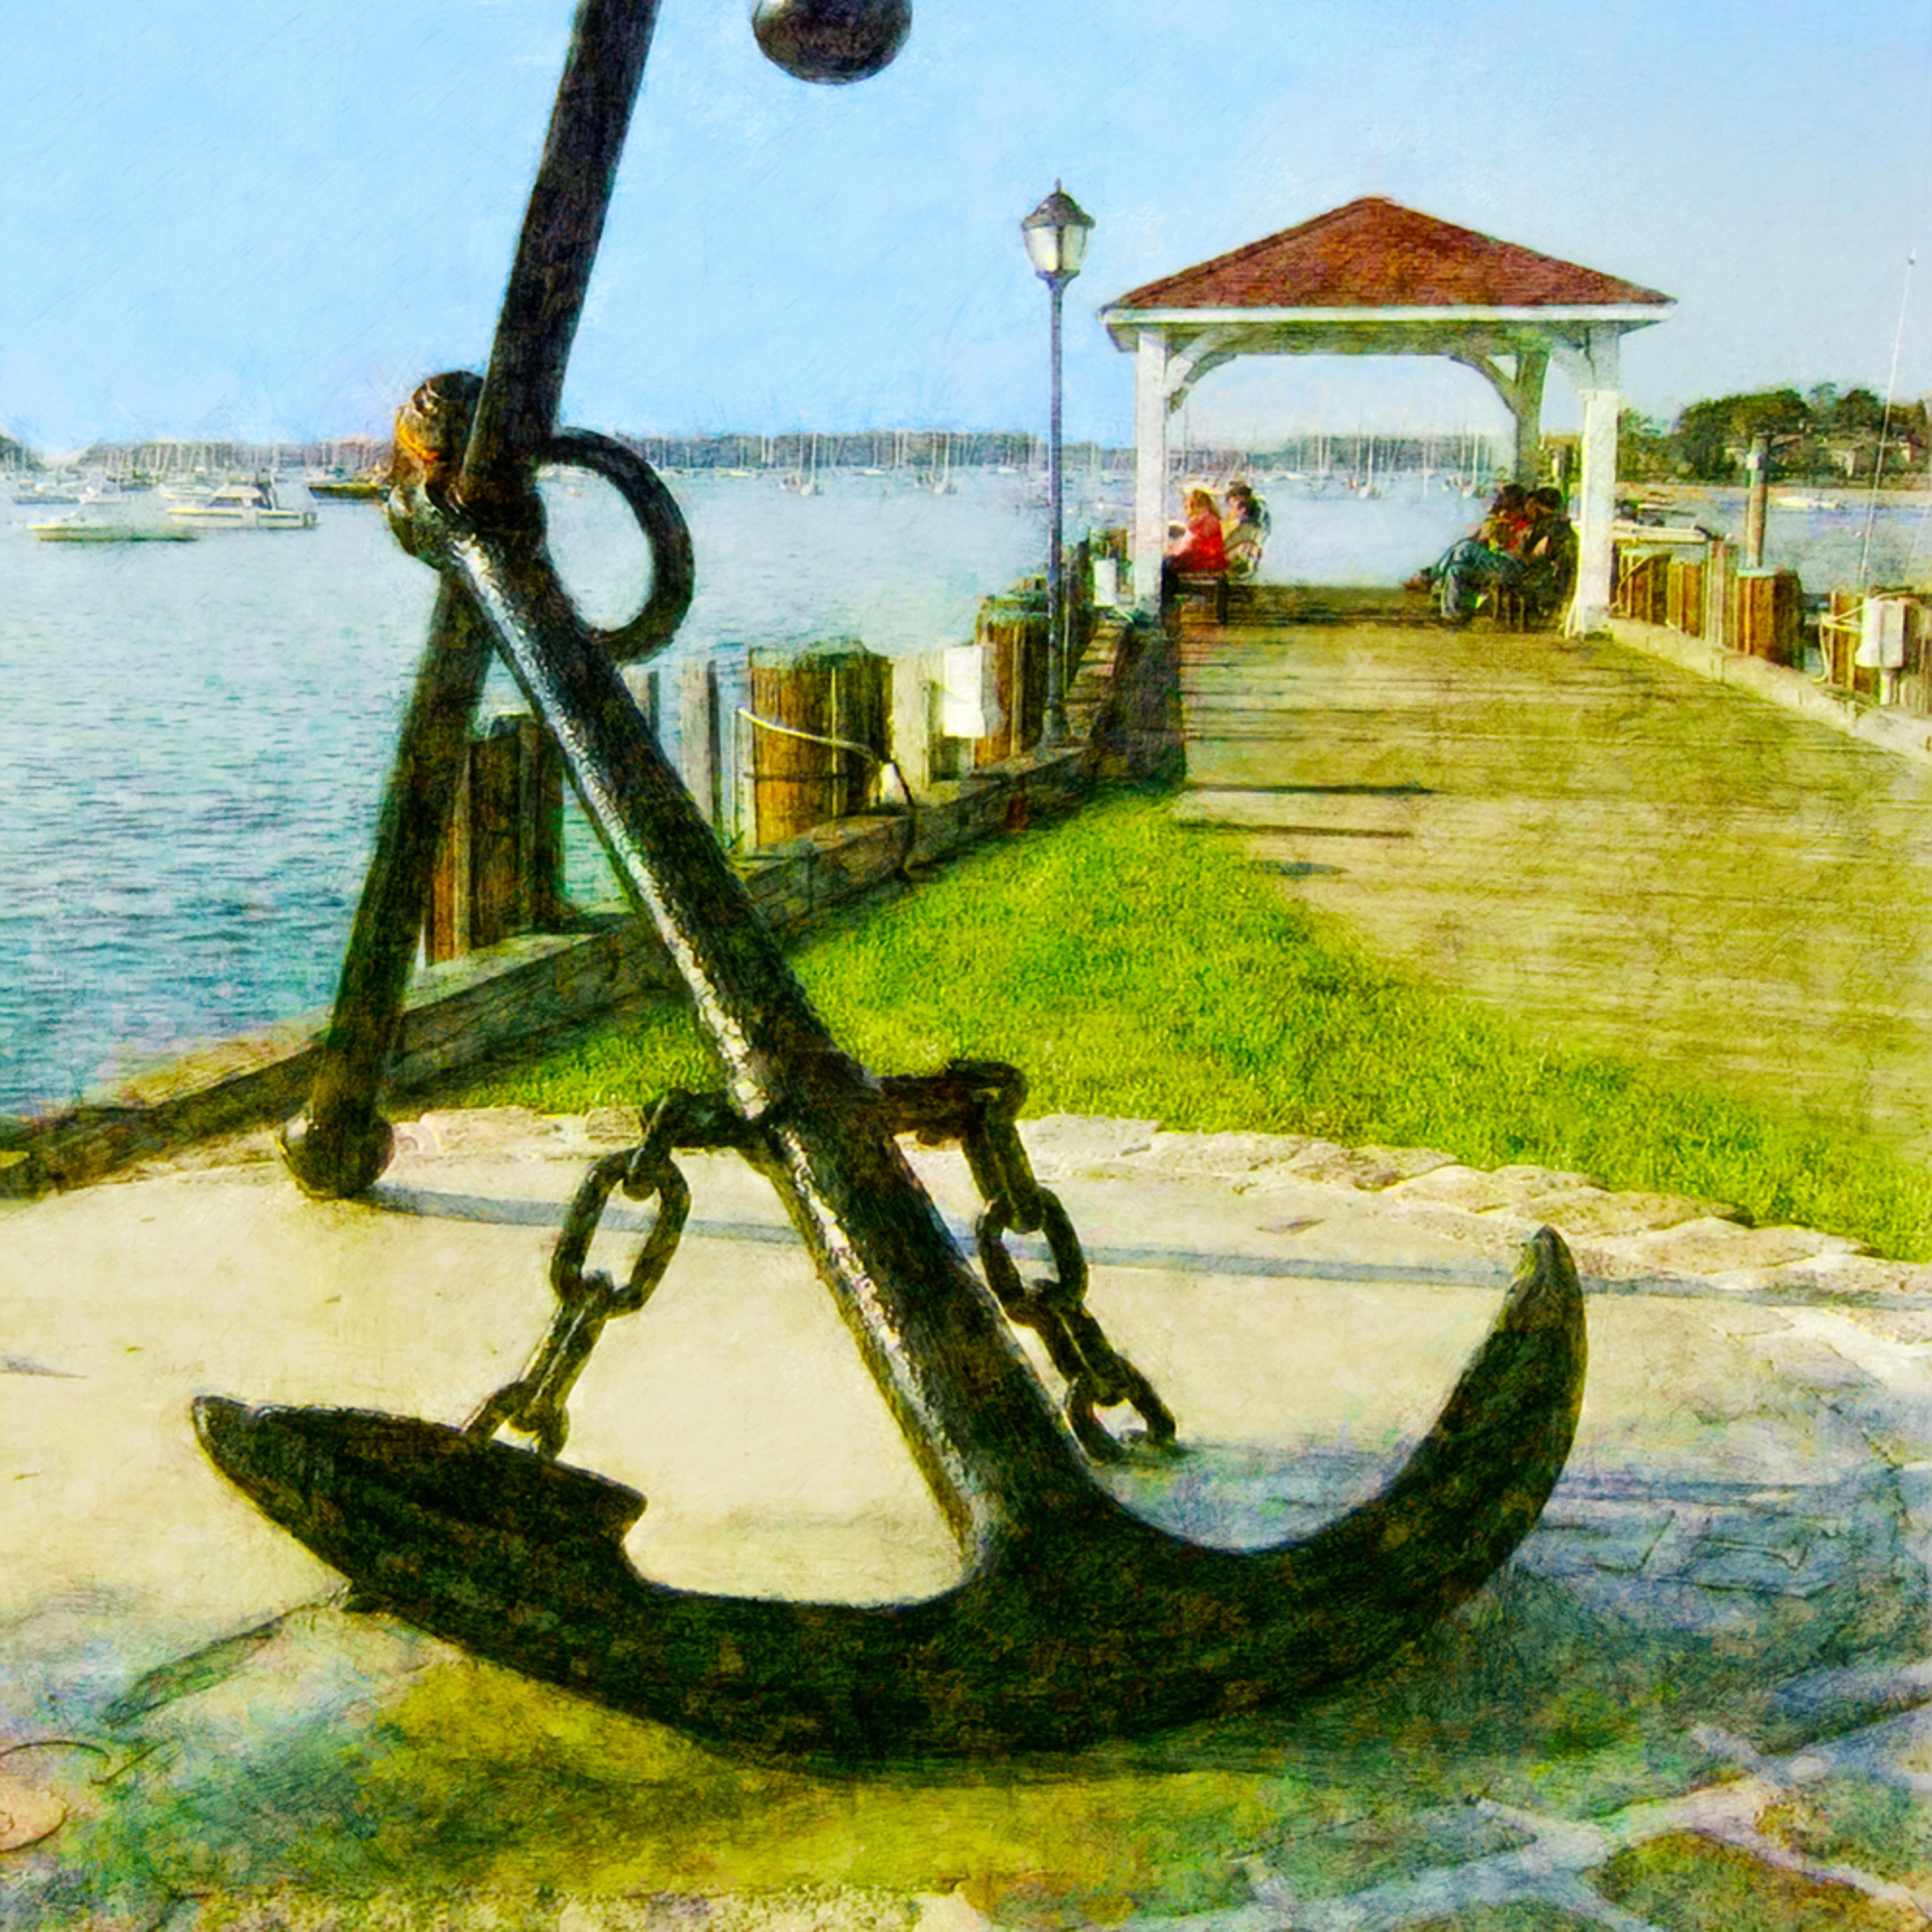 150706 ahern northport anchor 16x20x300 hgi886